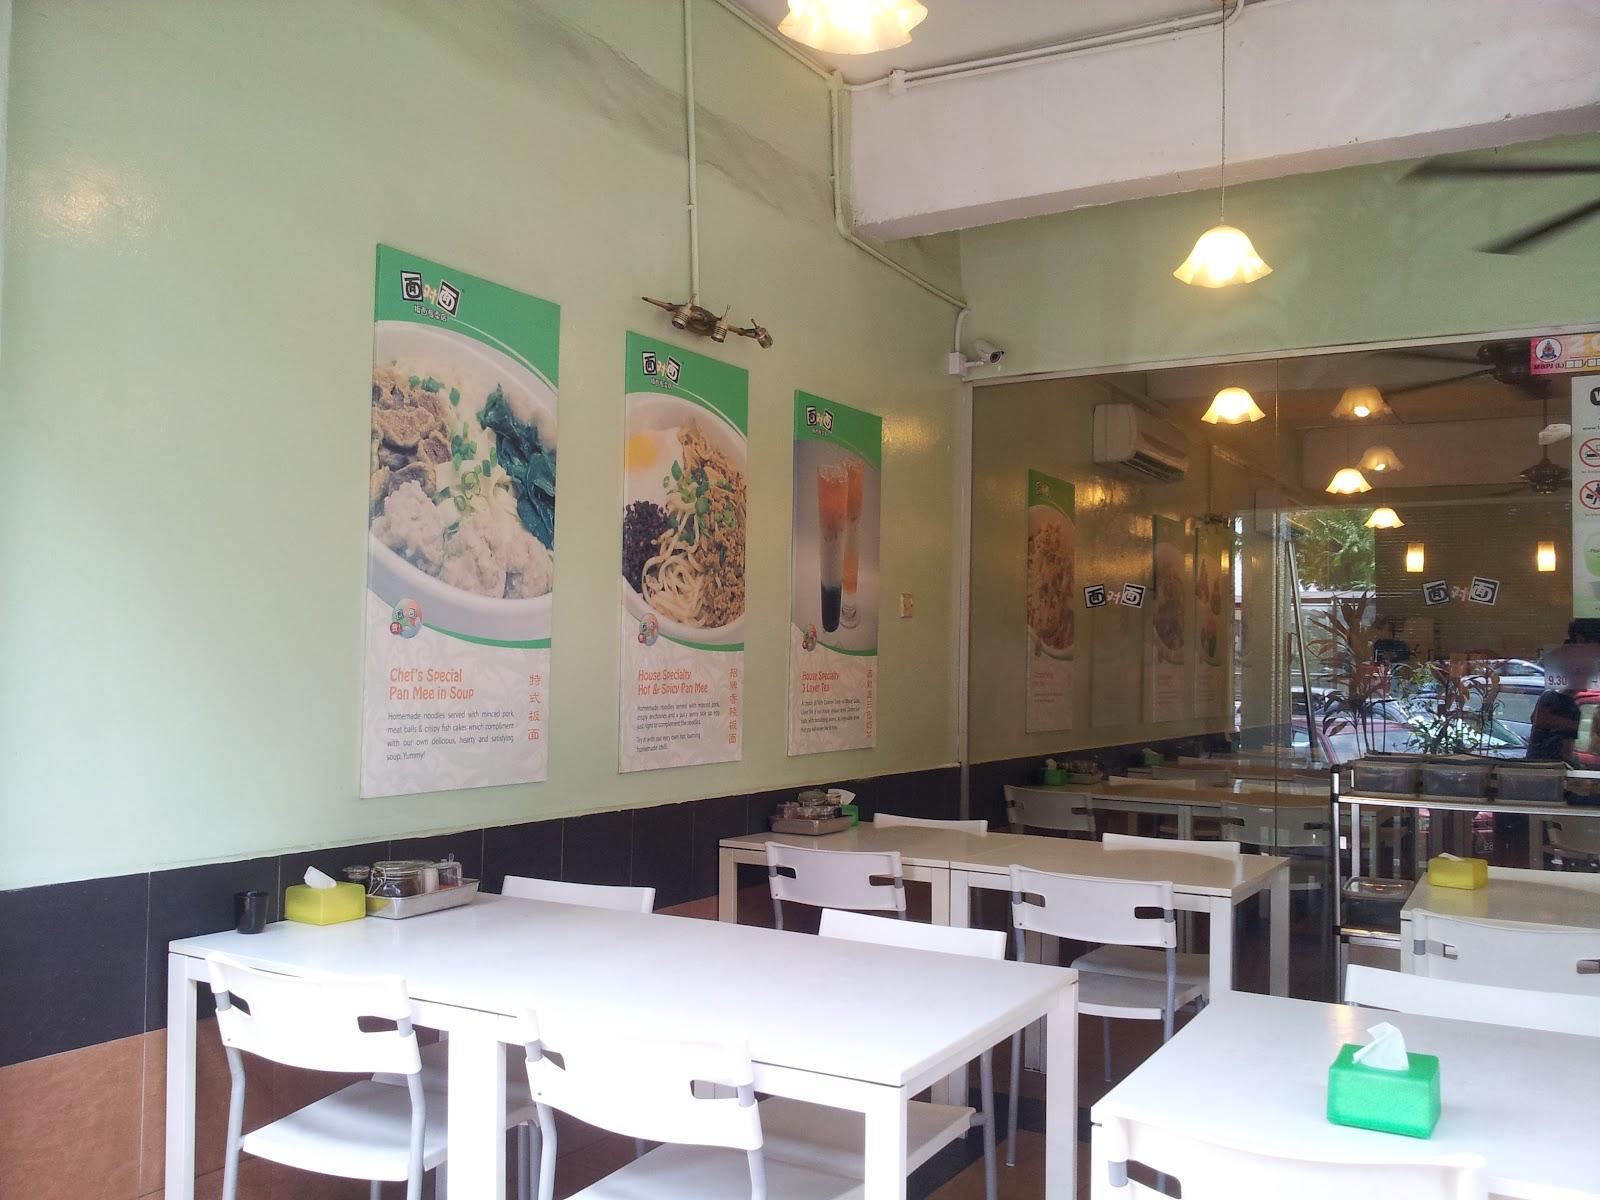 Eat Like a Boss: Face to face noodle house @ Damansara uptown Noodle House Design on fast food design, peruvian design, greek design, african design, american design, international design, middle eastern design, buffet design, catering design, hawaiian design, southwestern design, puerto rican design, eclectic design, pizza design, korean design, mongolian design, tibetan design, steakhouse design, mexican design, persian design,